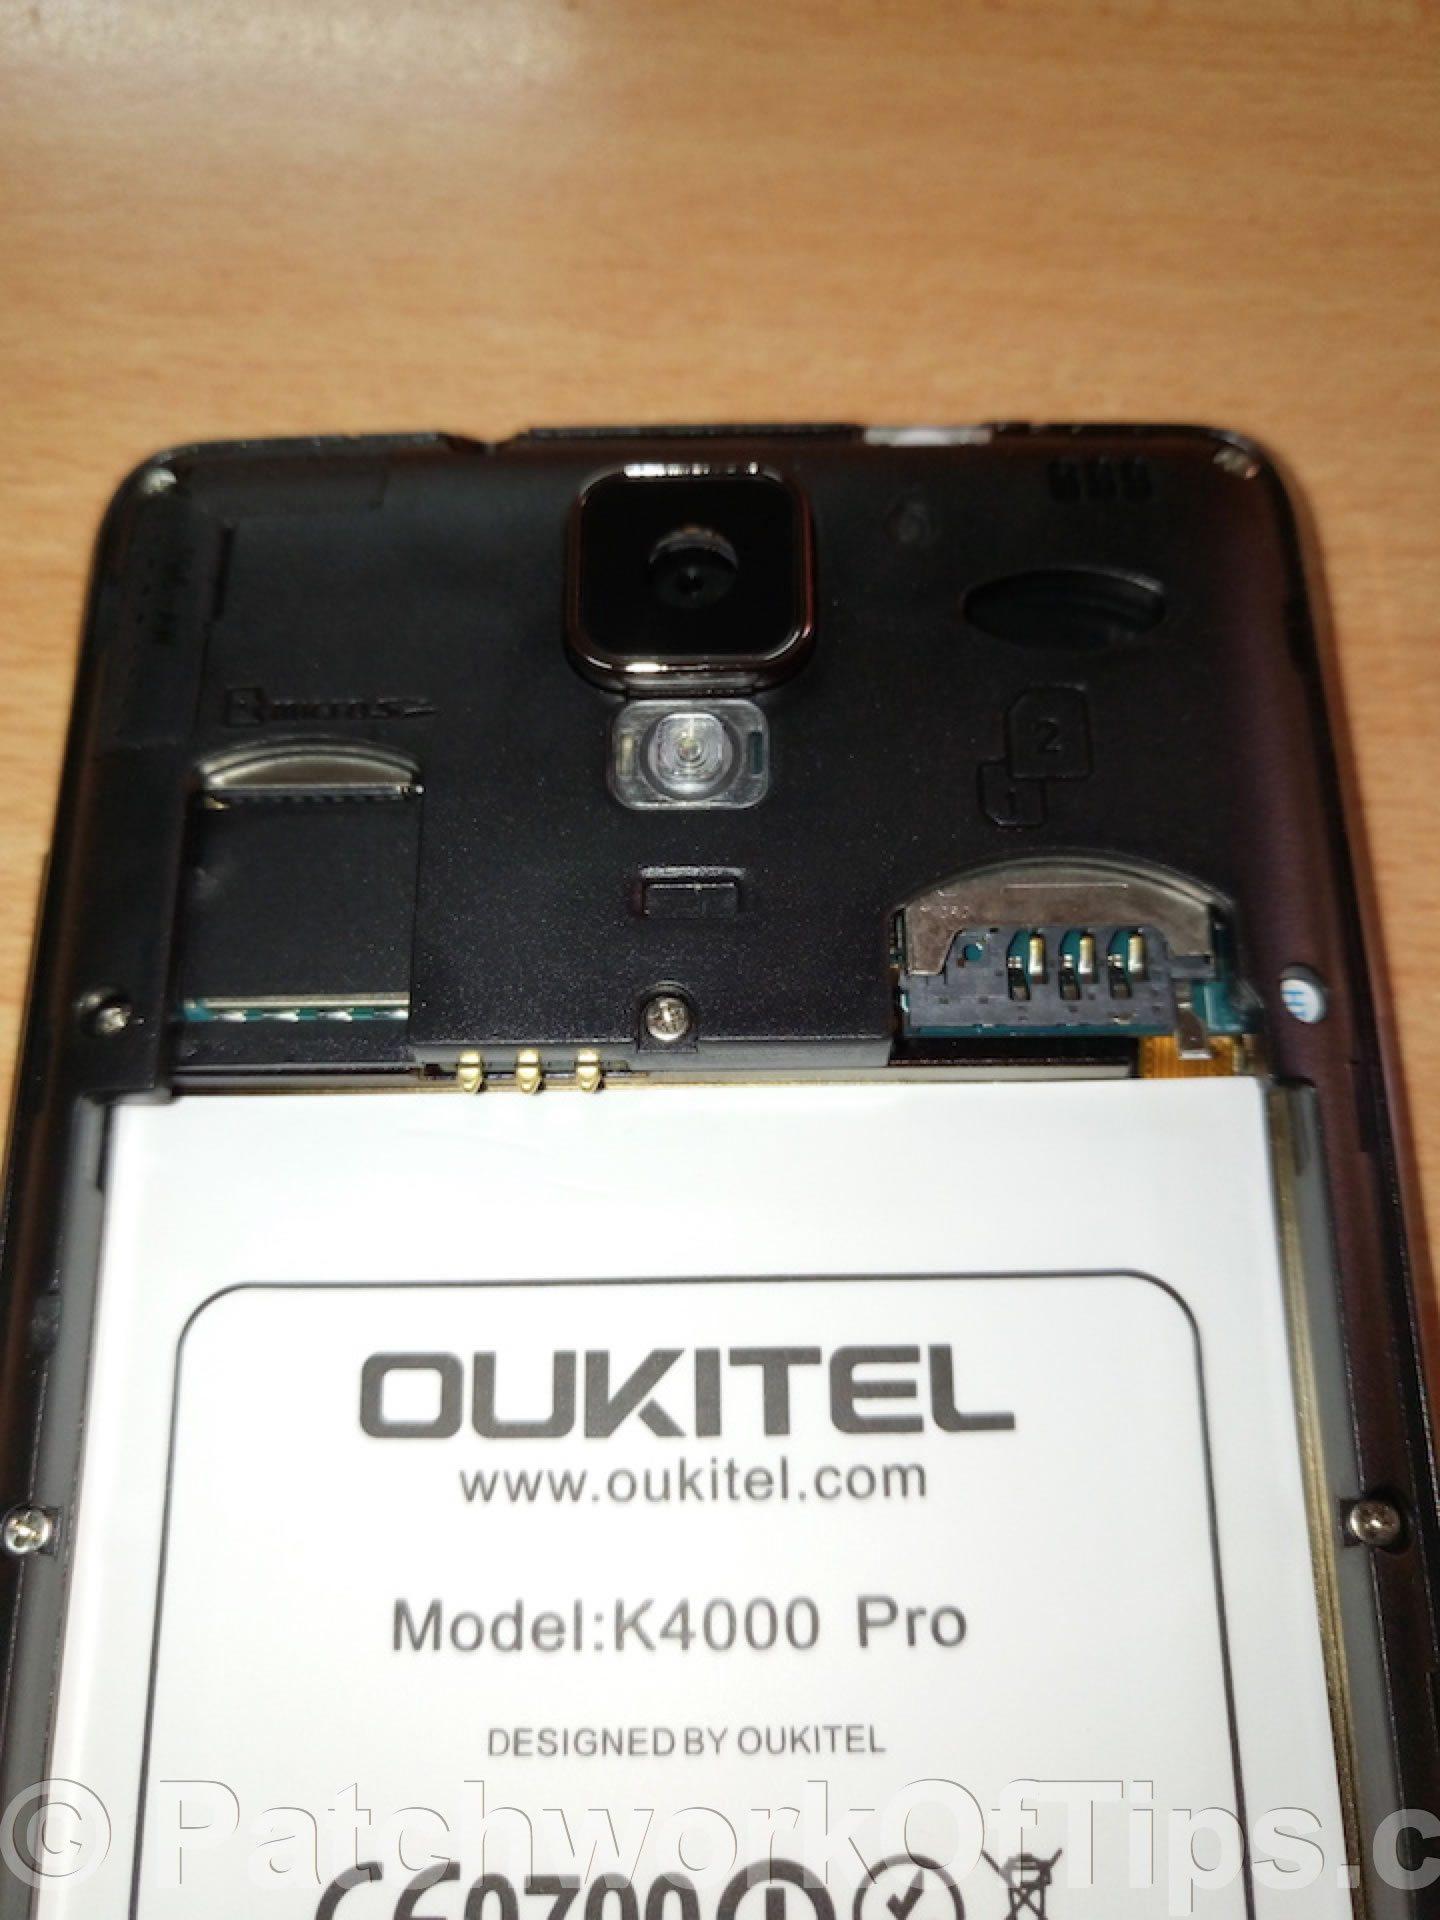 Oukitel K4000 Pro Camera, SIM & microSD card slot